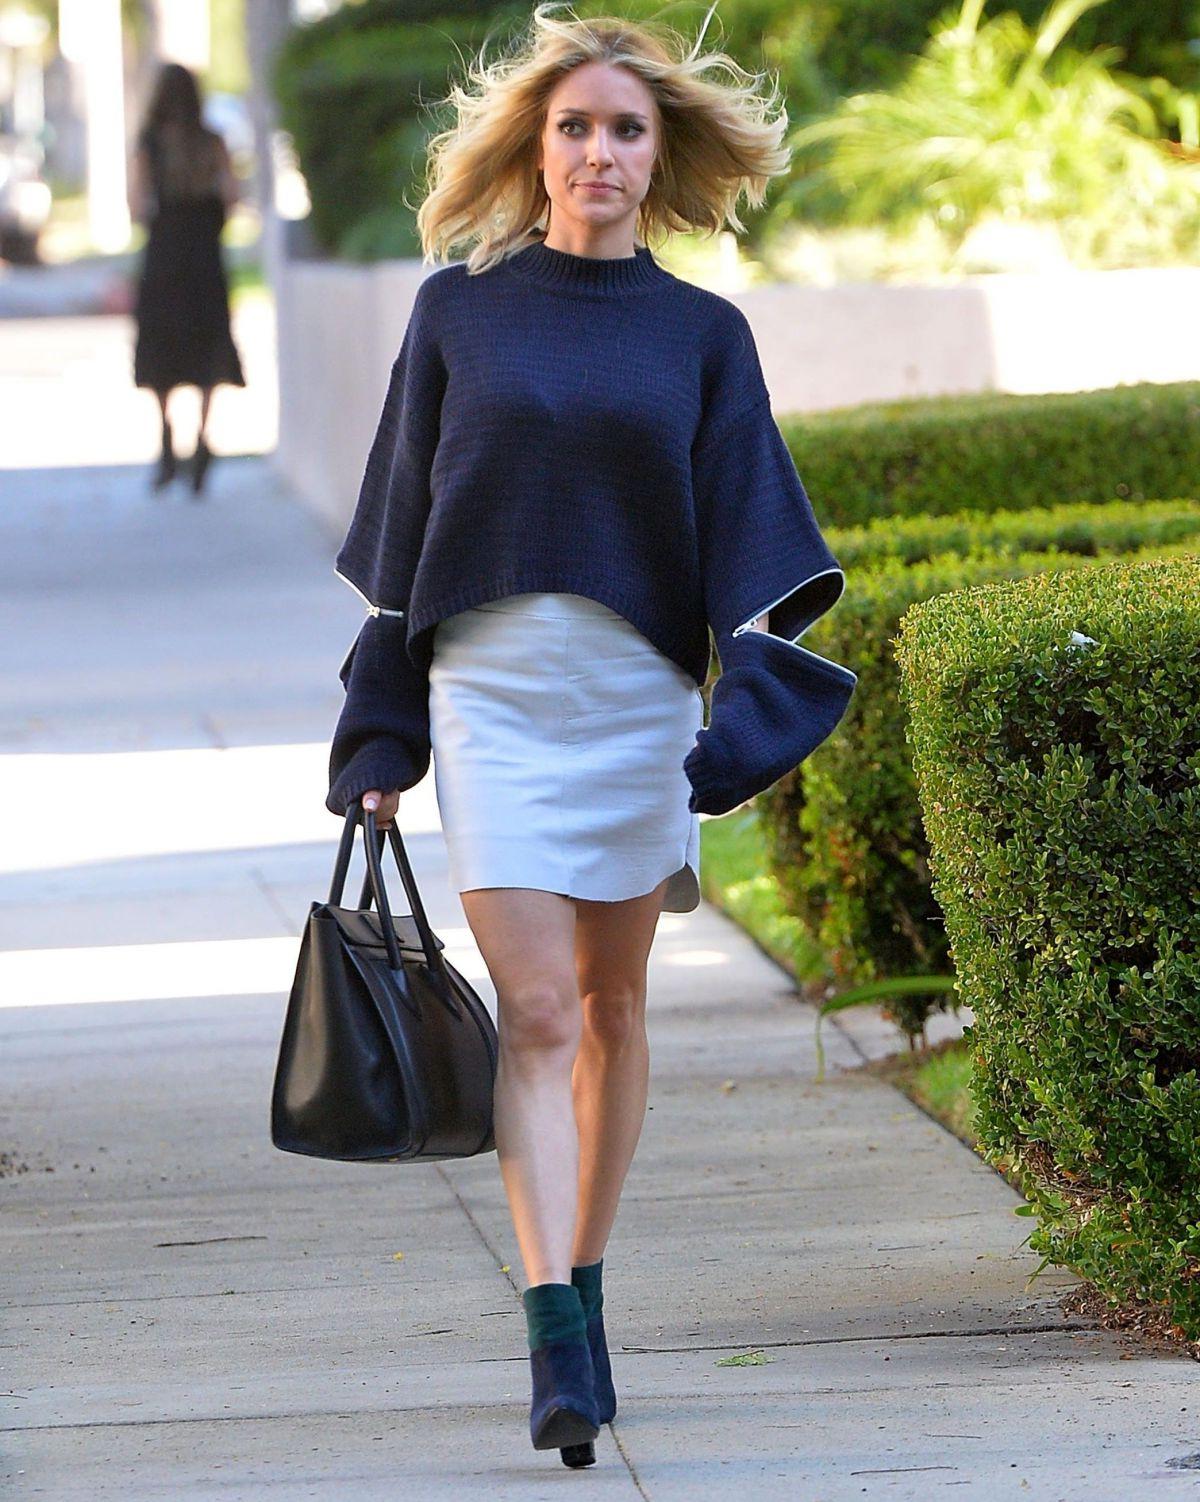 Kristin Cavallari In Short Skirt Leaves A Hair Salon In Beverly Pertaining To Kristin Cavallari Short Haircuts (View 10 of 25)